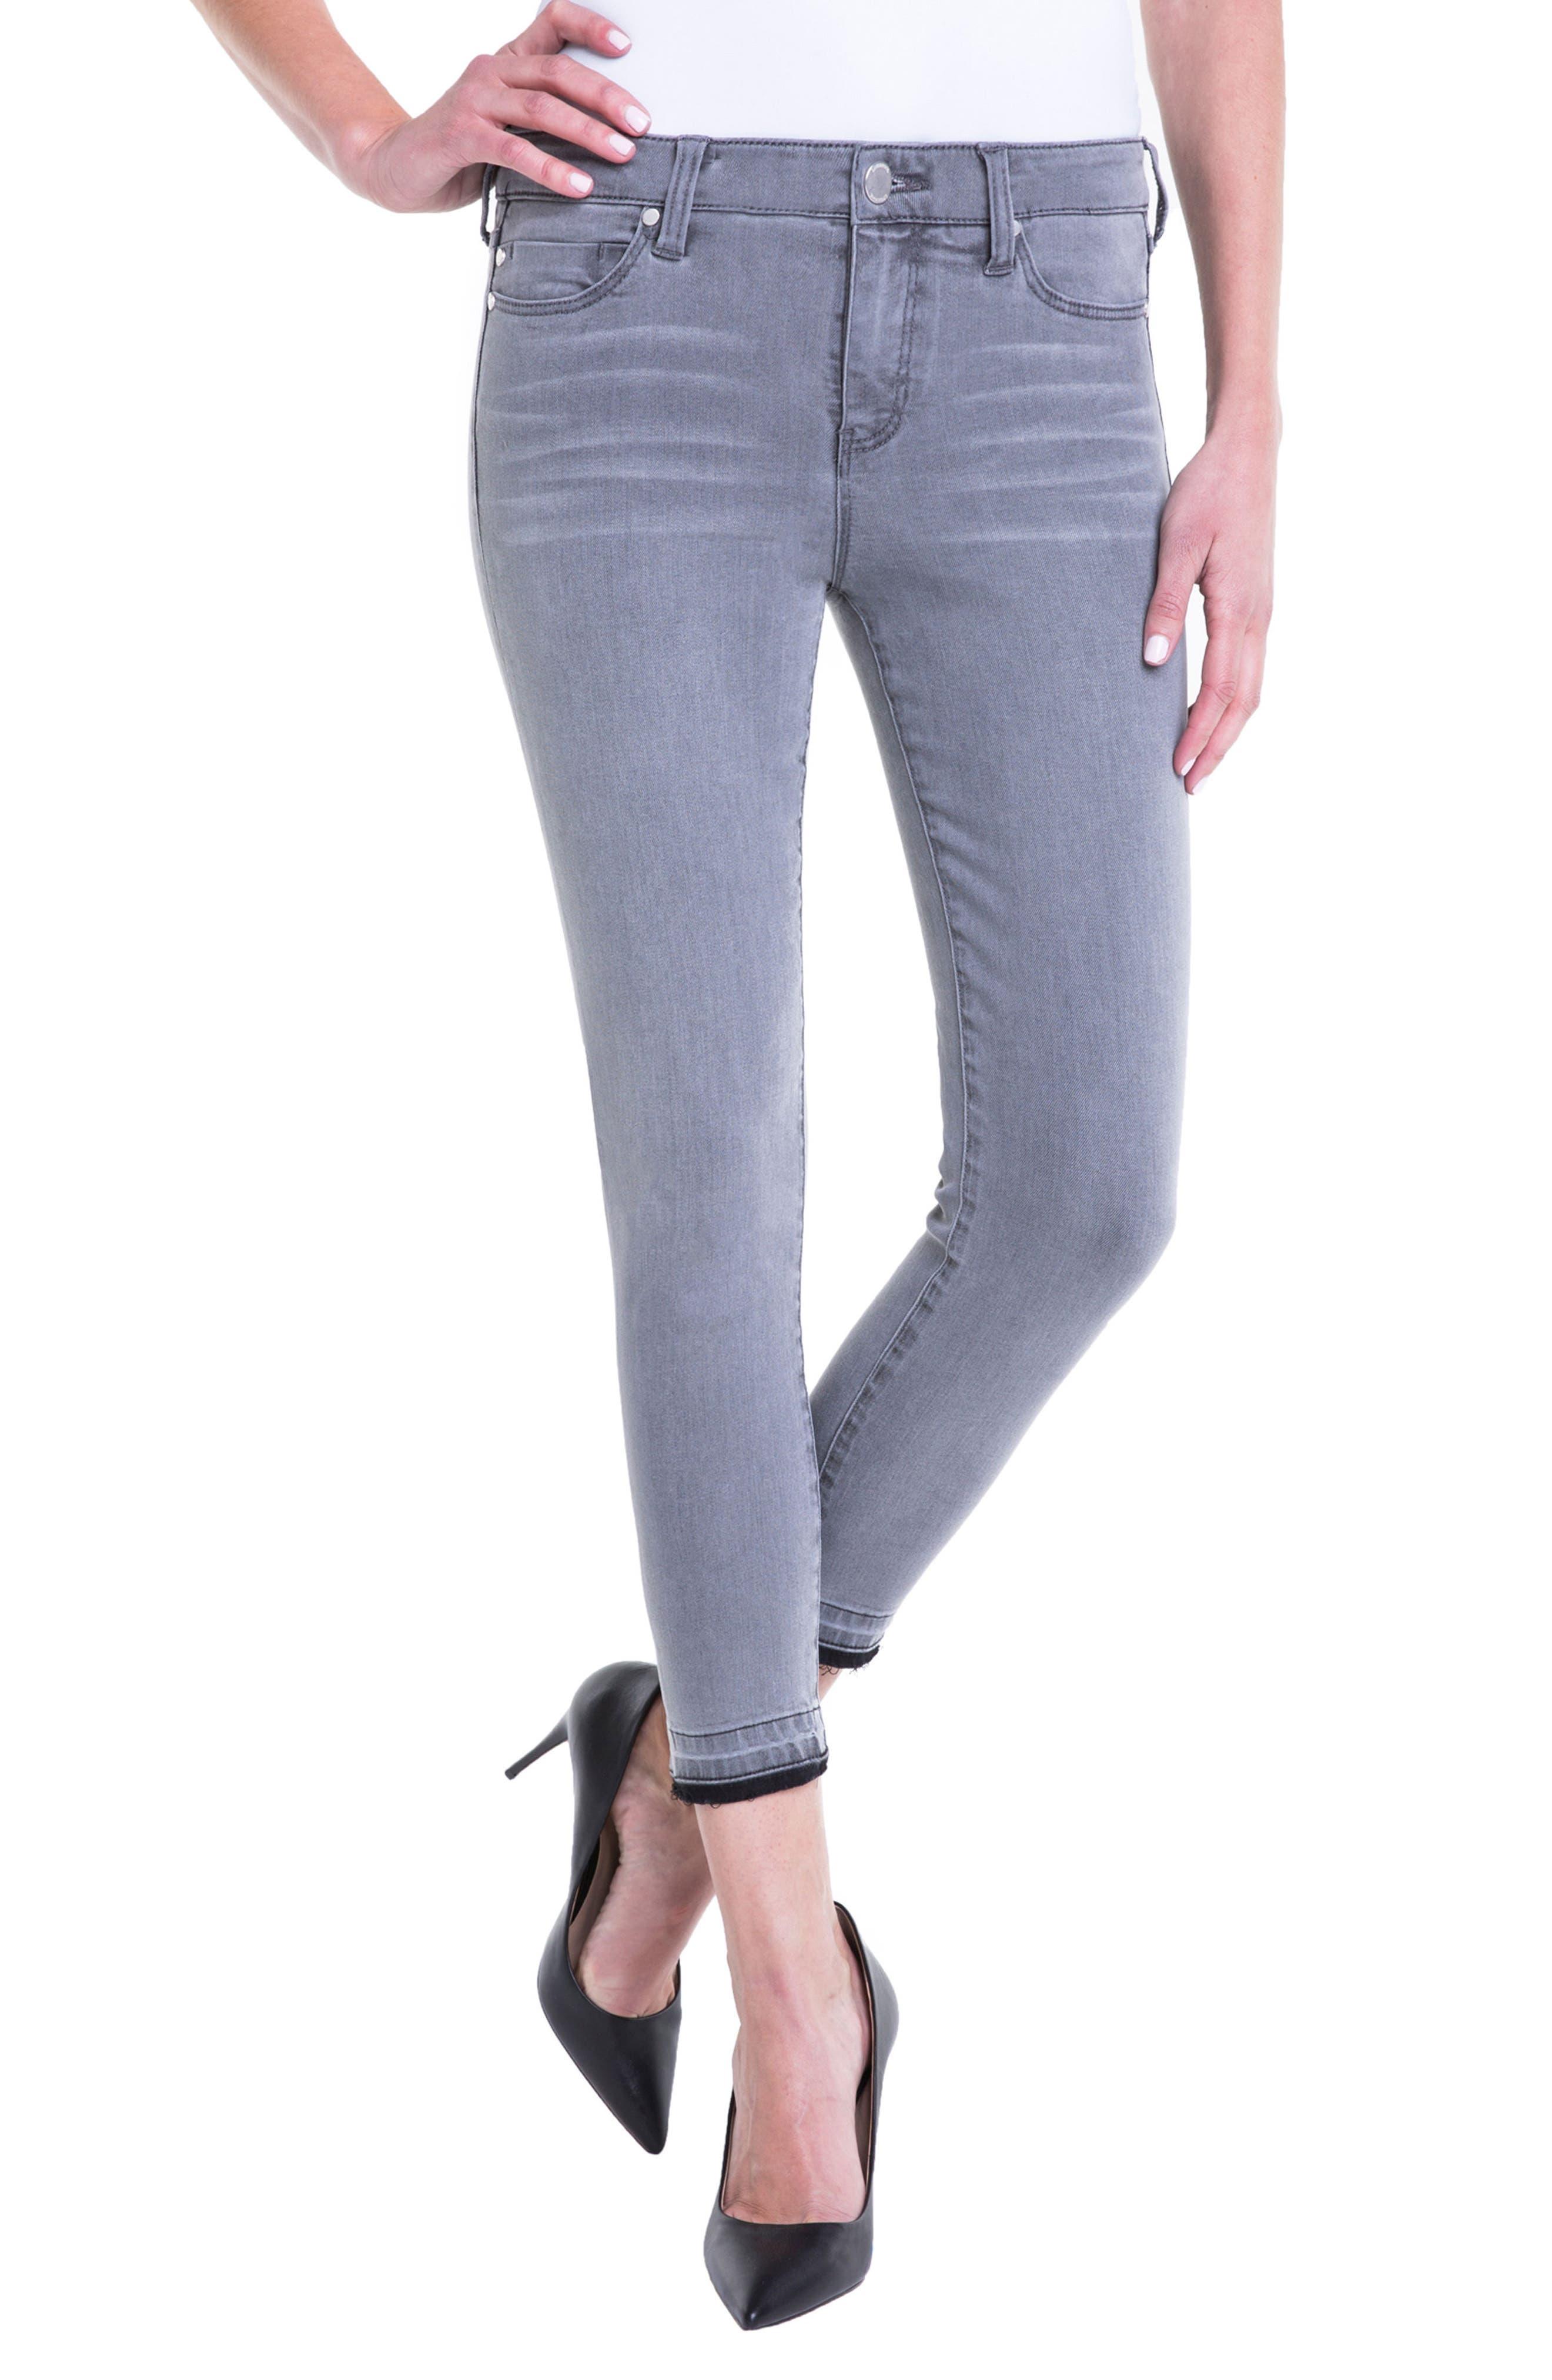 Main Image - Liverpool Jeans Company Avery Release Hem Crop Jeans (Aluminum)